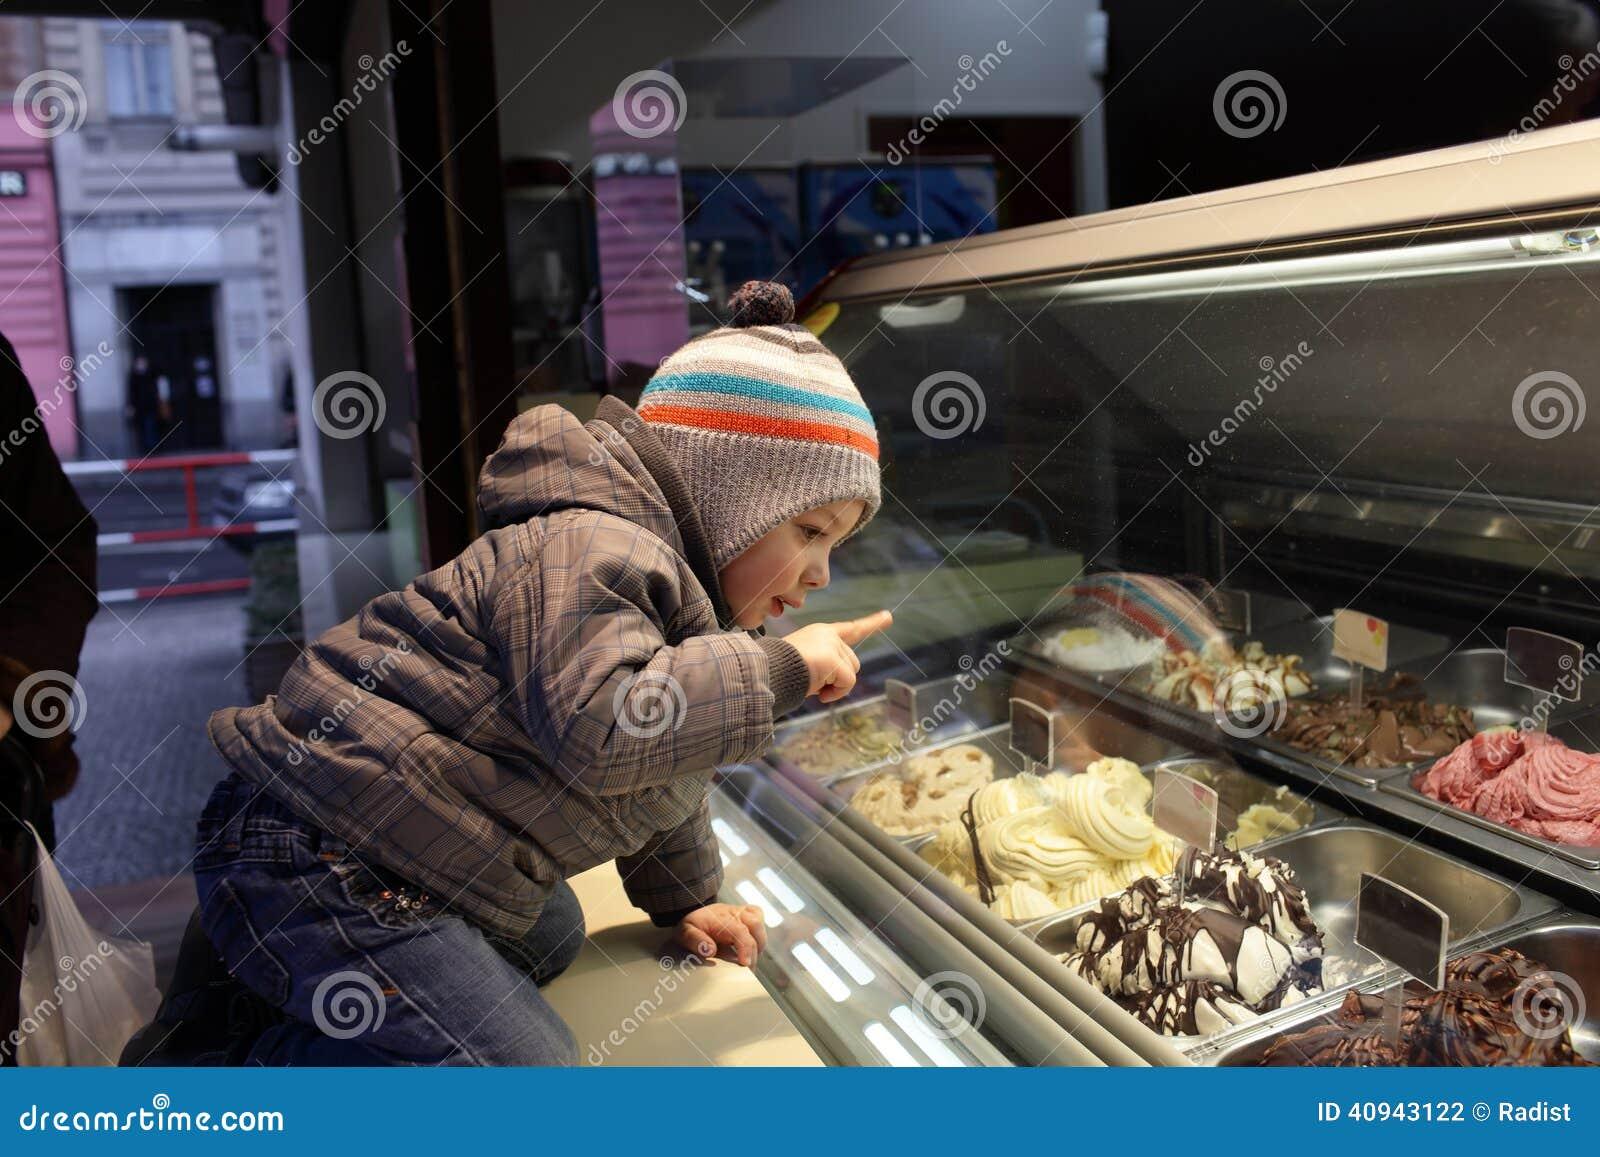 child choosing ice cream stock photo image 40943122